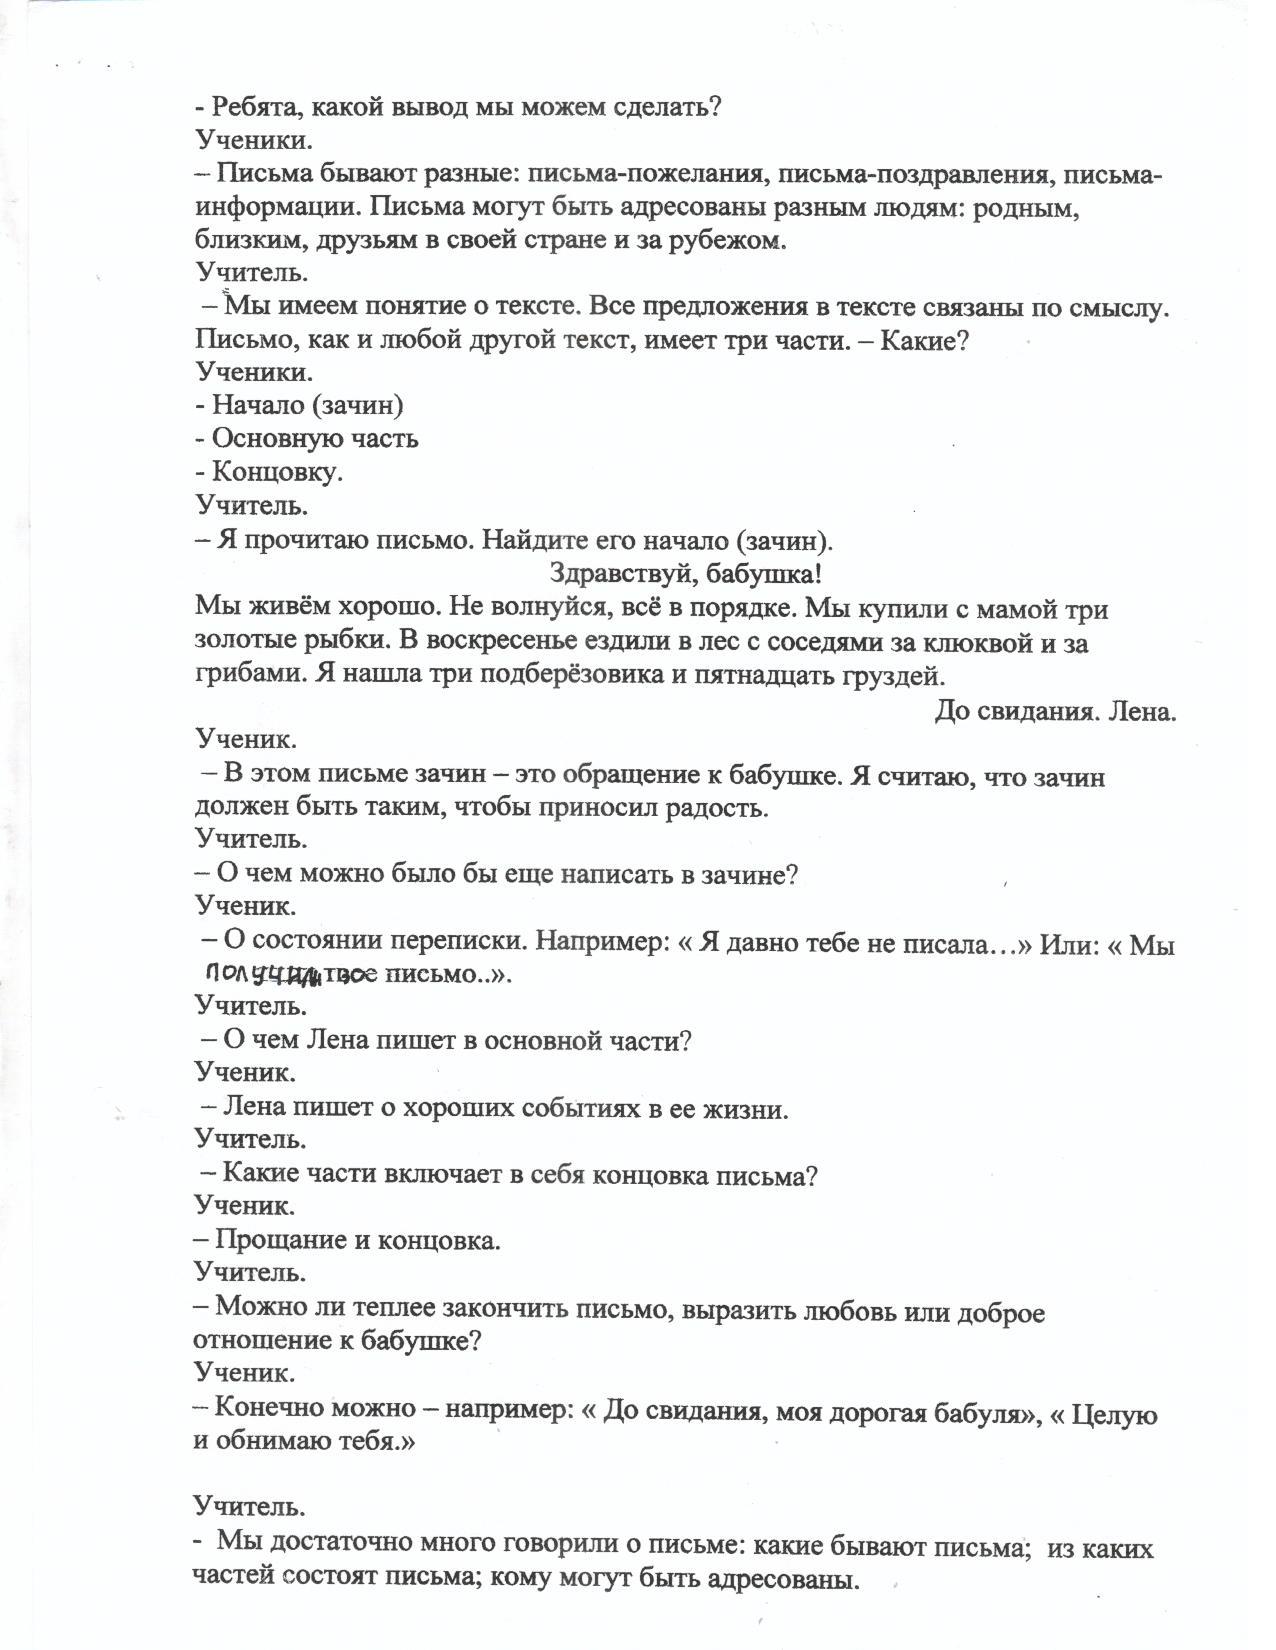 H:\сканер работ\Урок письма\стр5.jpg